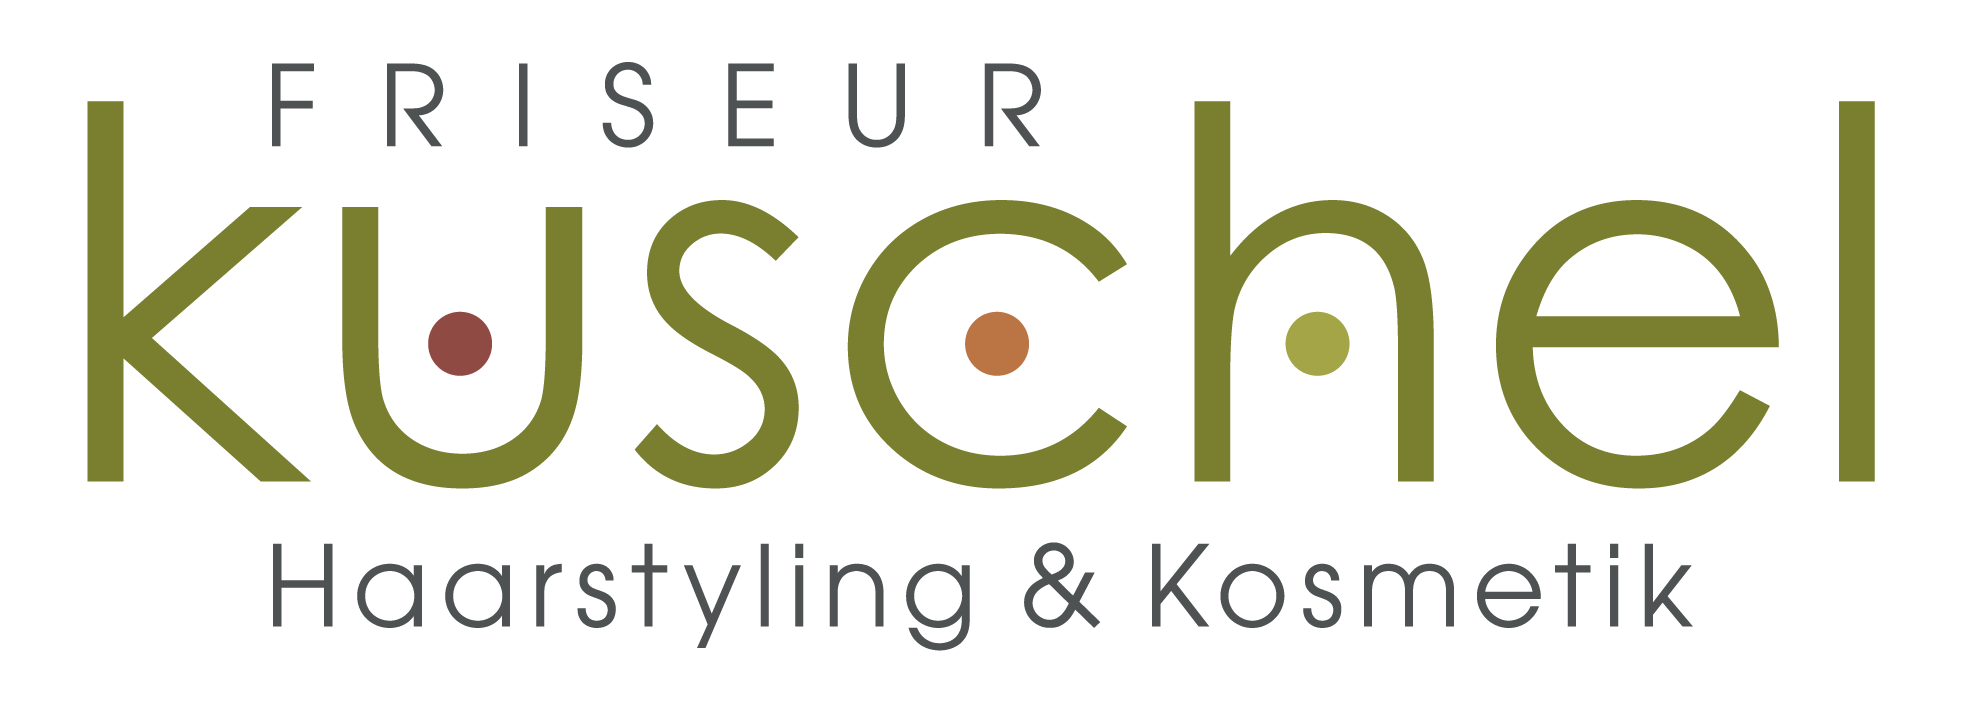 Friseur Kuschel